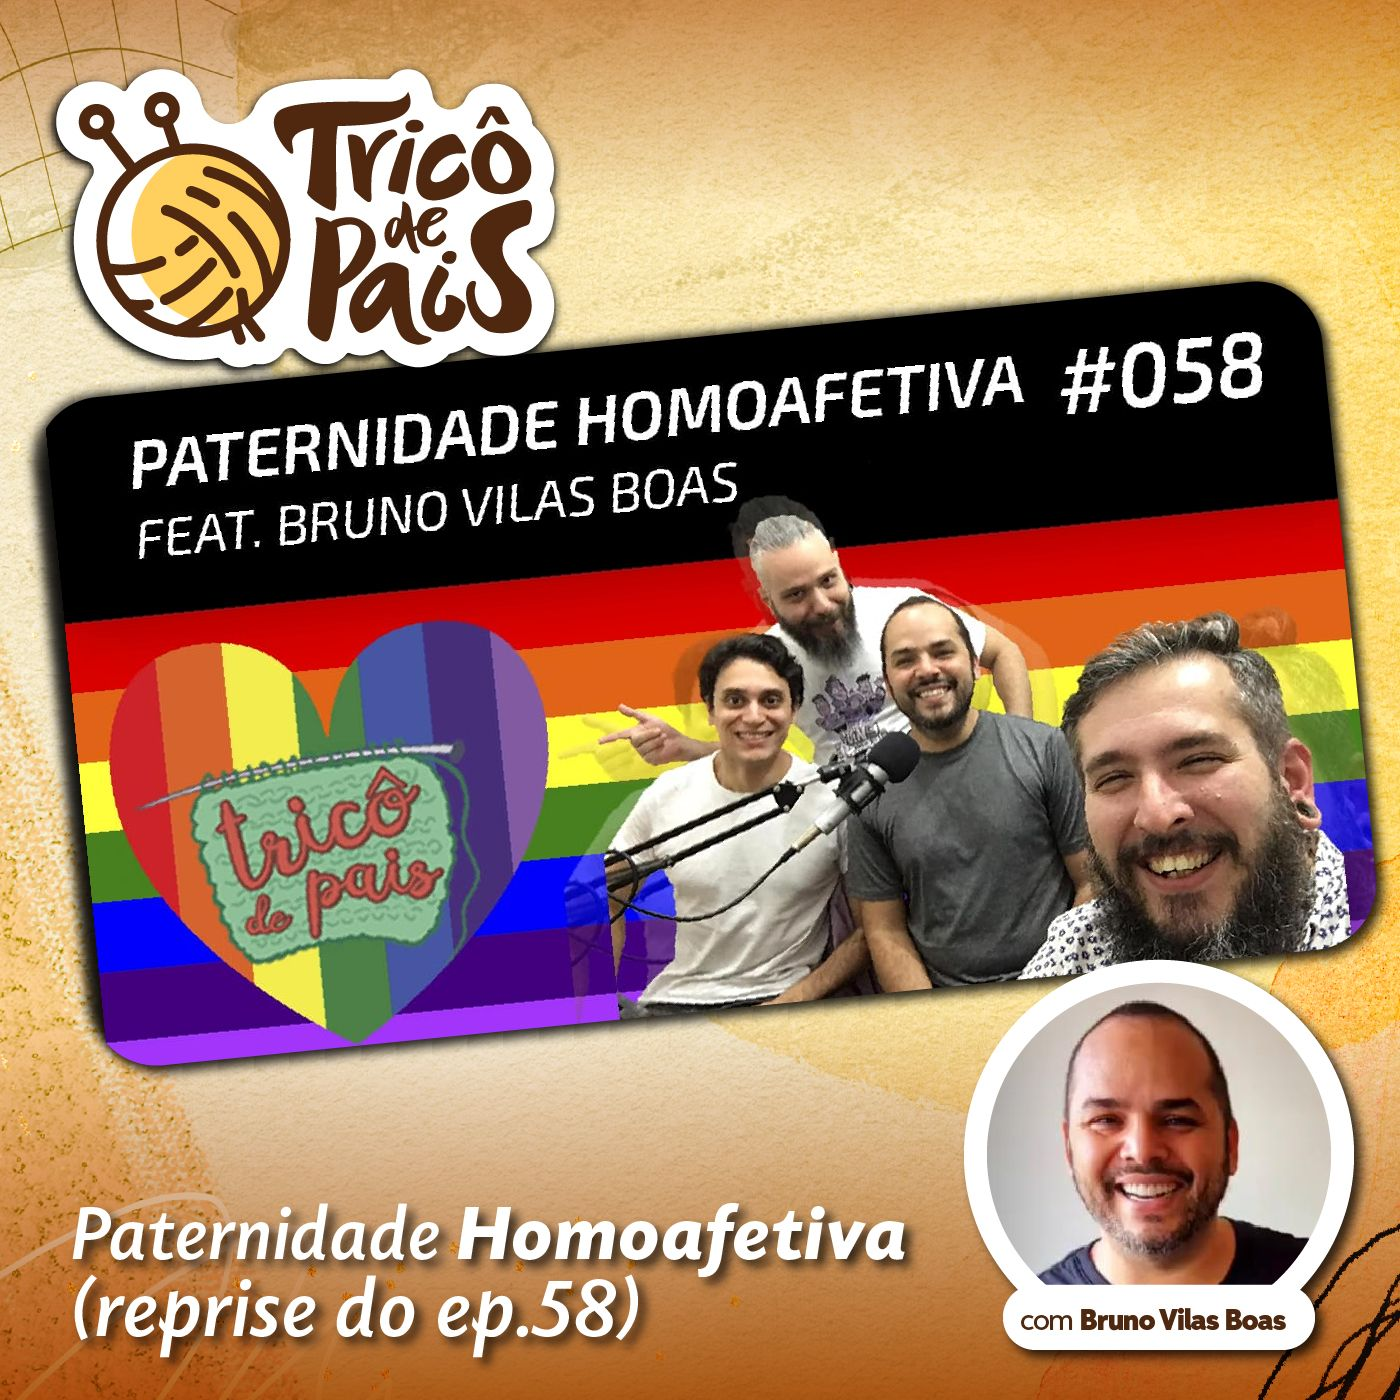 Reprise - #058 - Paternidade Homoafetiva feat. Bruno Vilas Boas